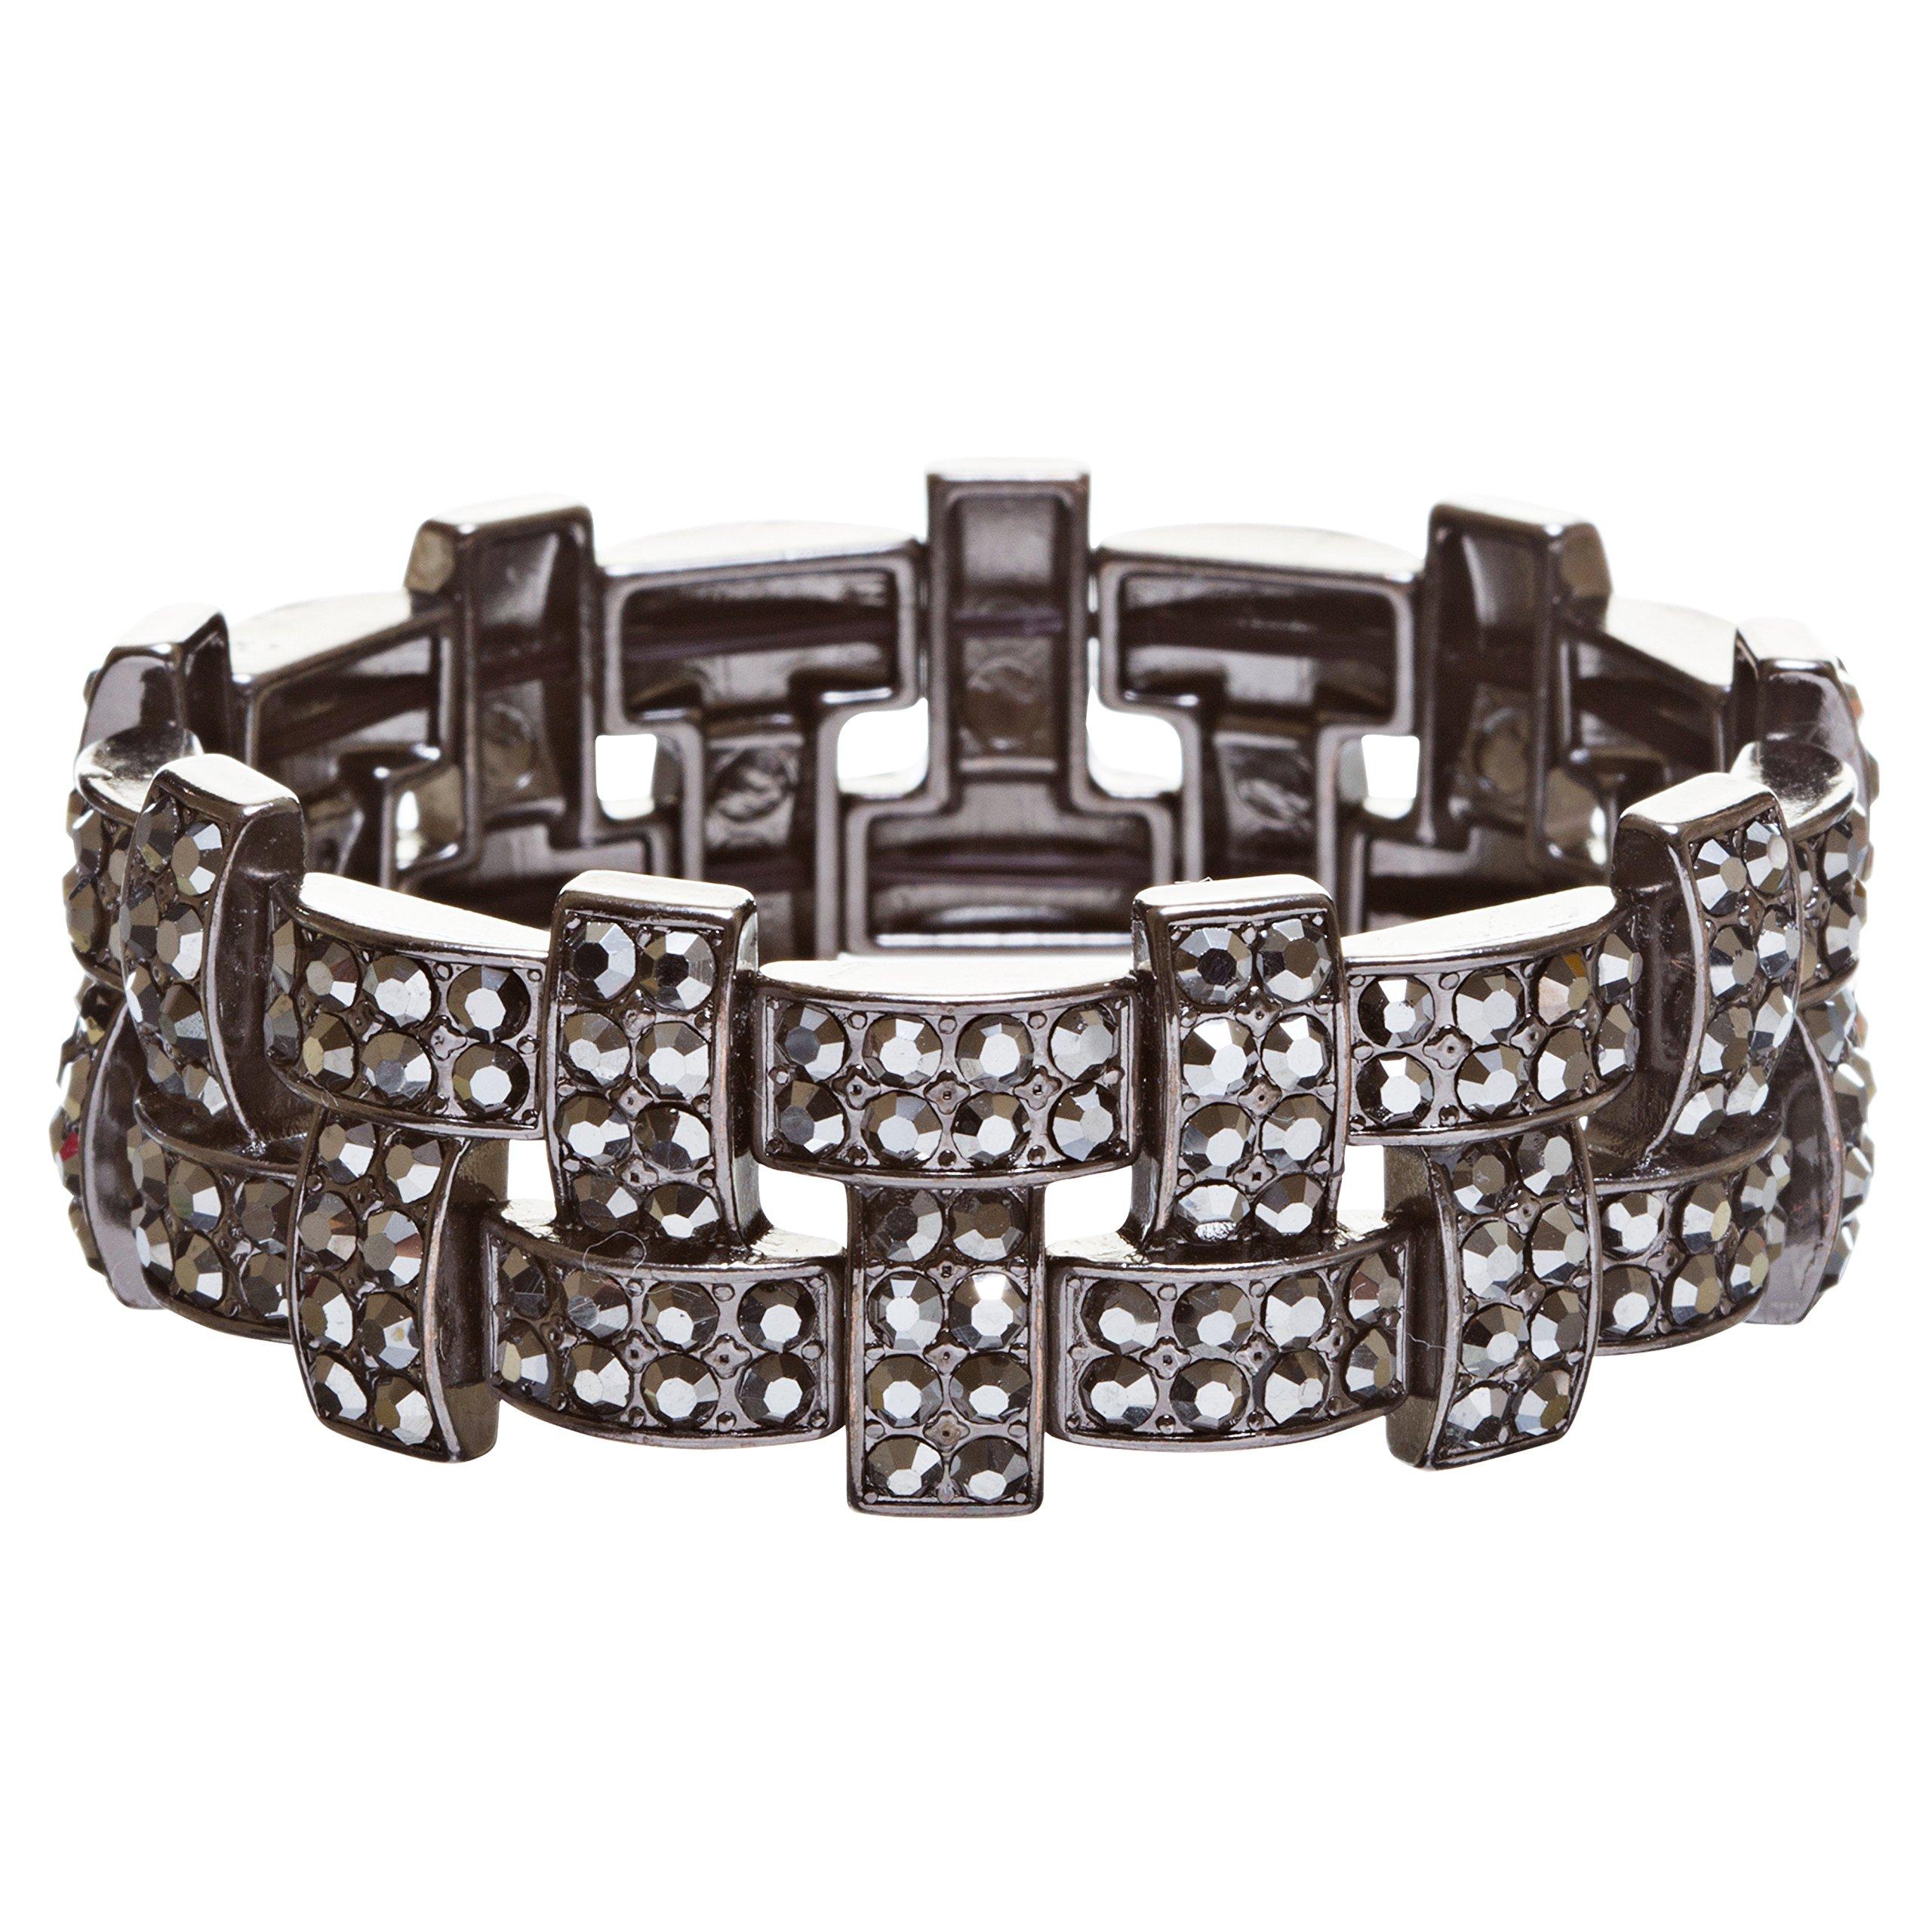 ACCESSORIESFOREVER Bridal Wedding Jewelry Crystal Rhinestone Stunning Woven Stretch Bracelet B278 Black